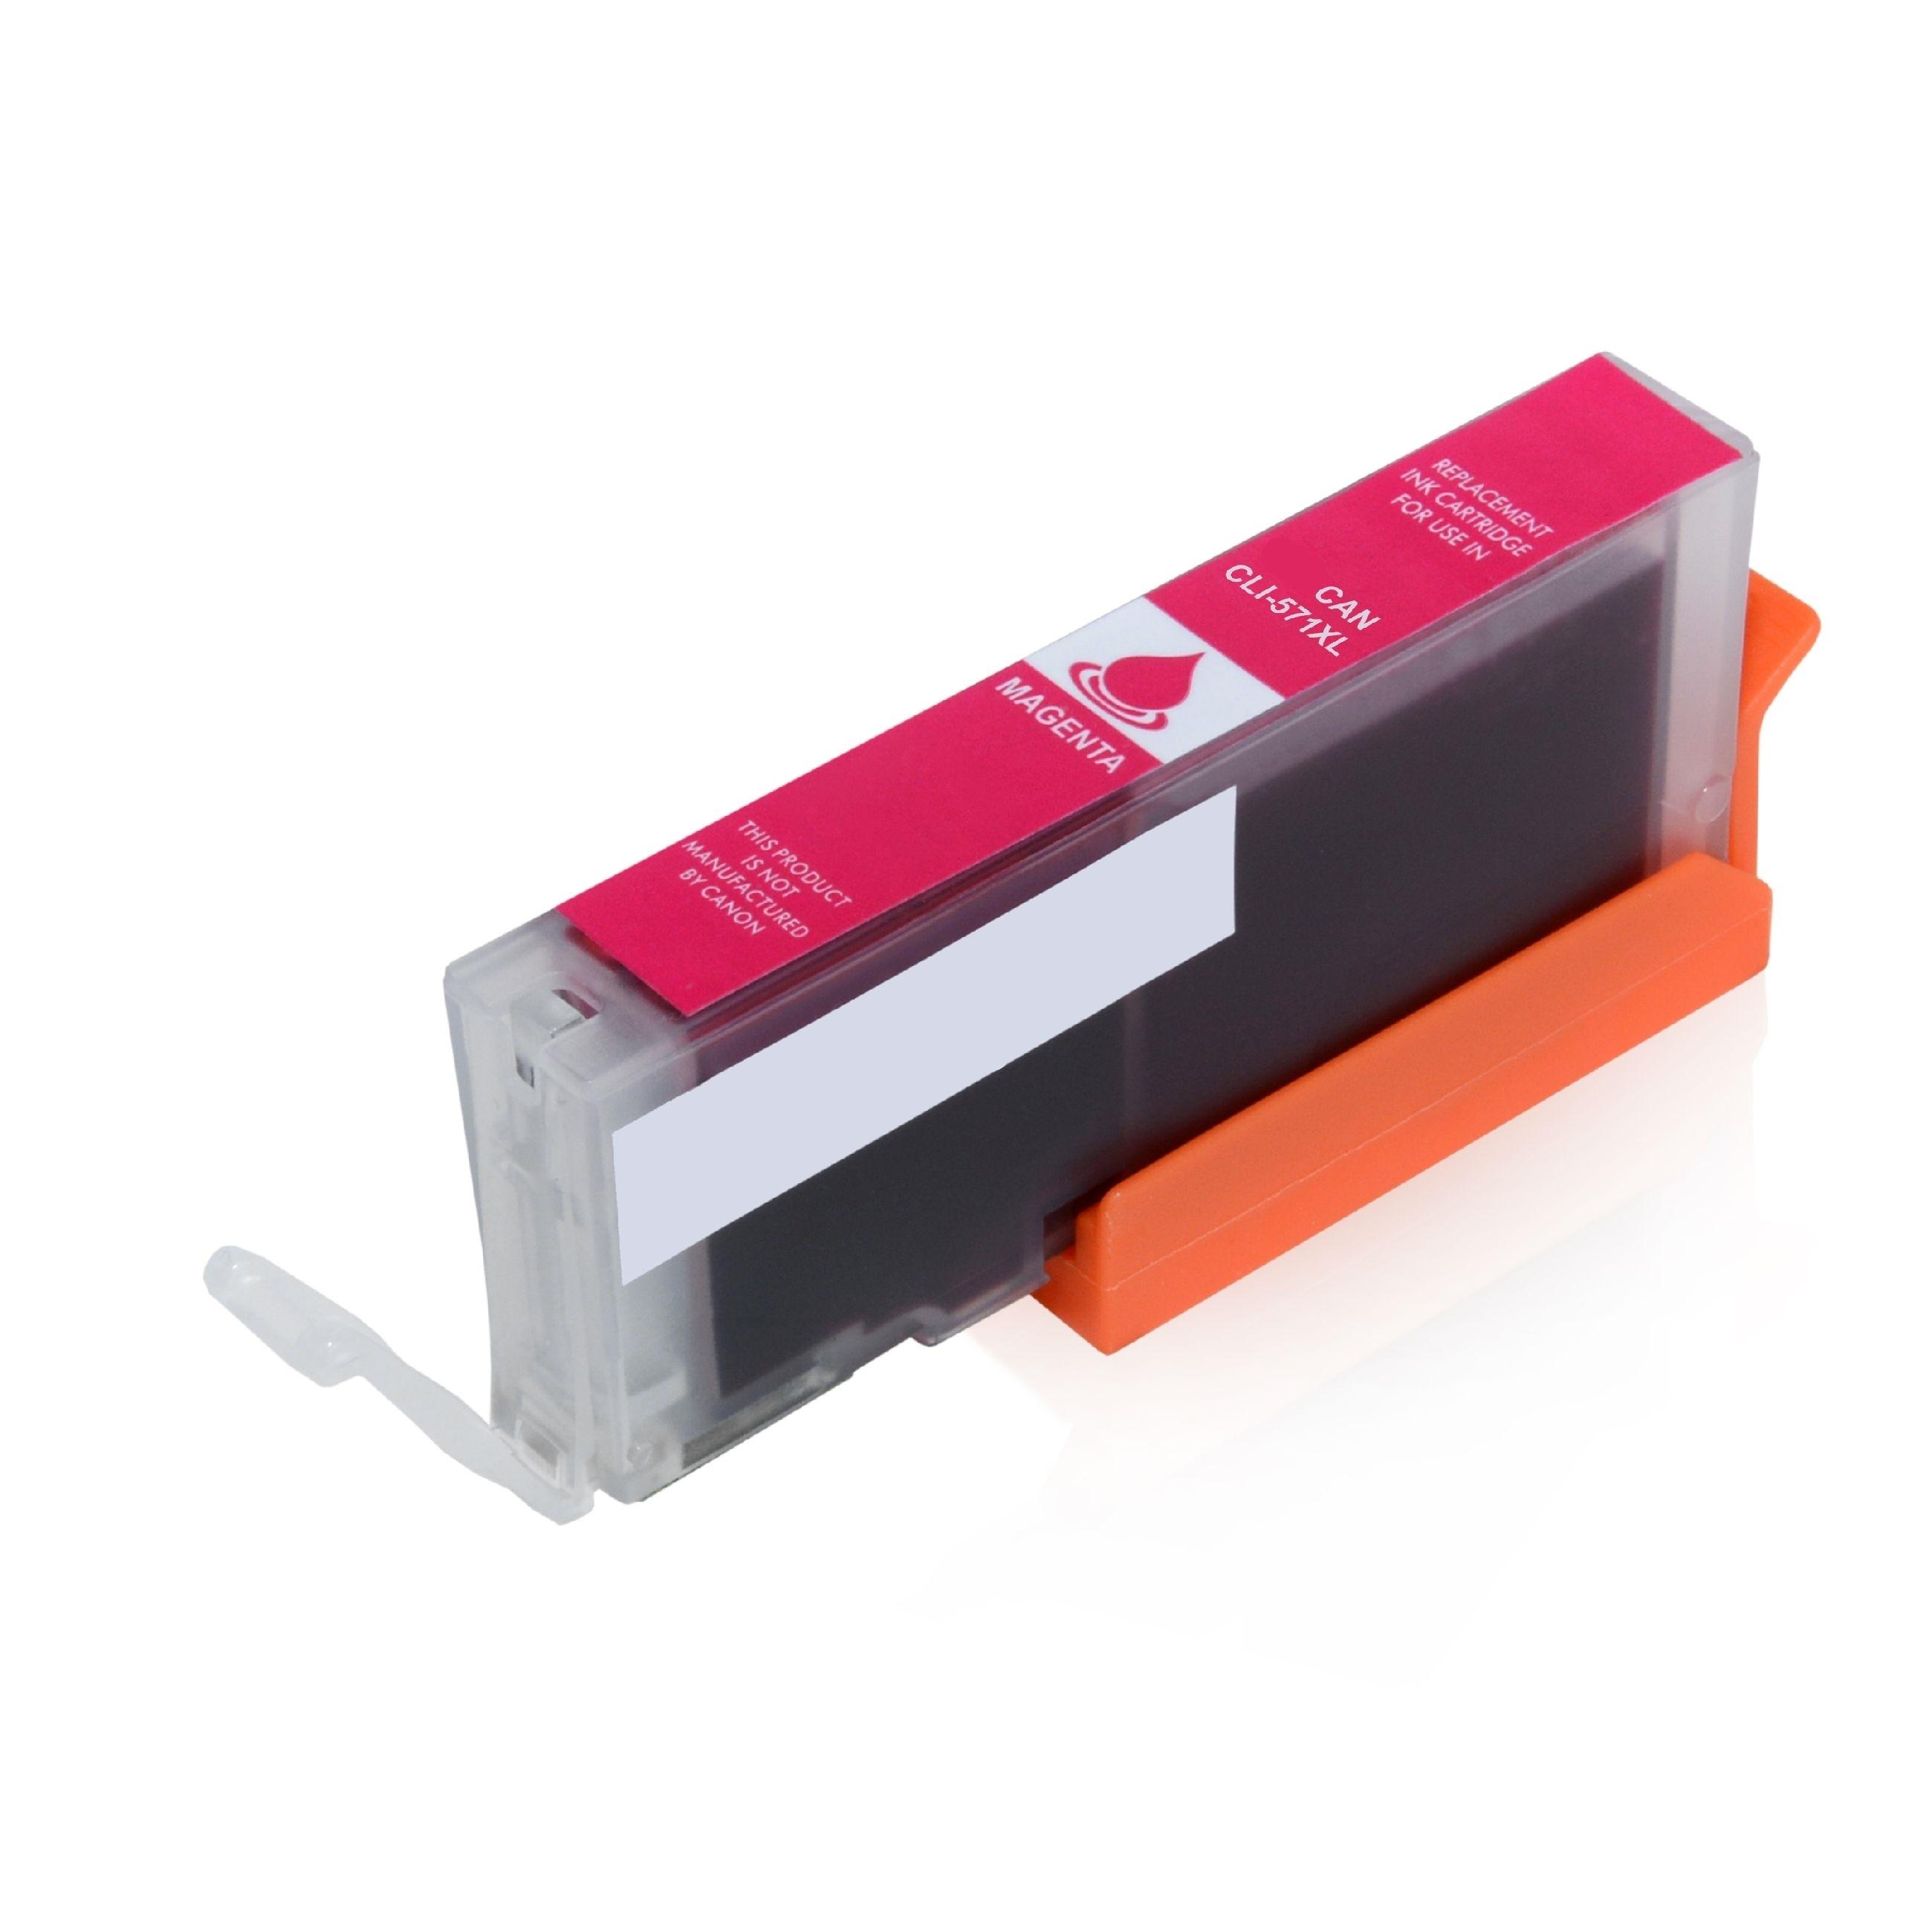 ASC-Premium-Tintenpatrone für Canon Pixma MG 5750 magenta Pixma MG 5750 PixmaMG5750